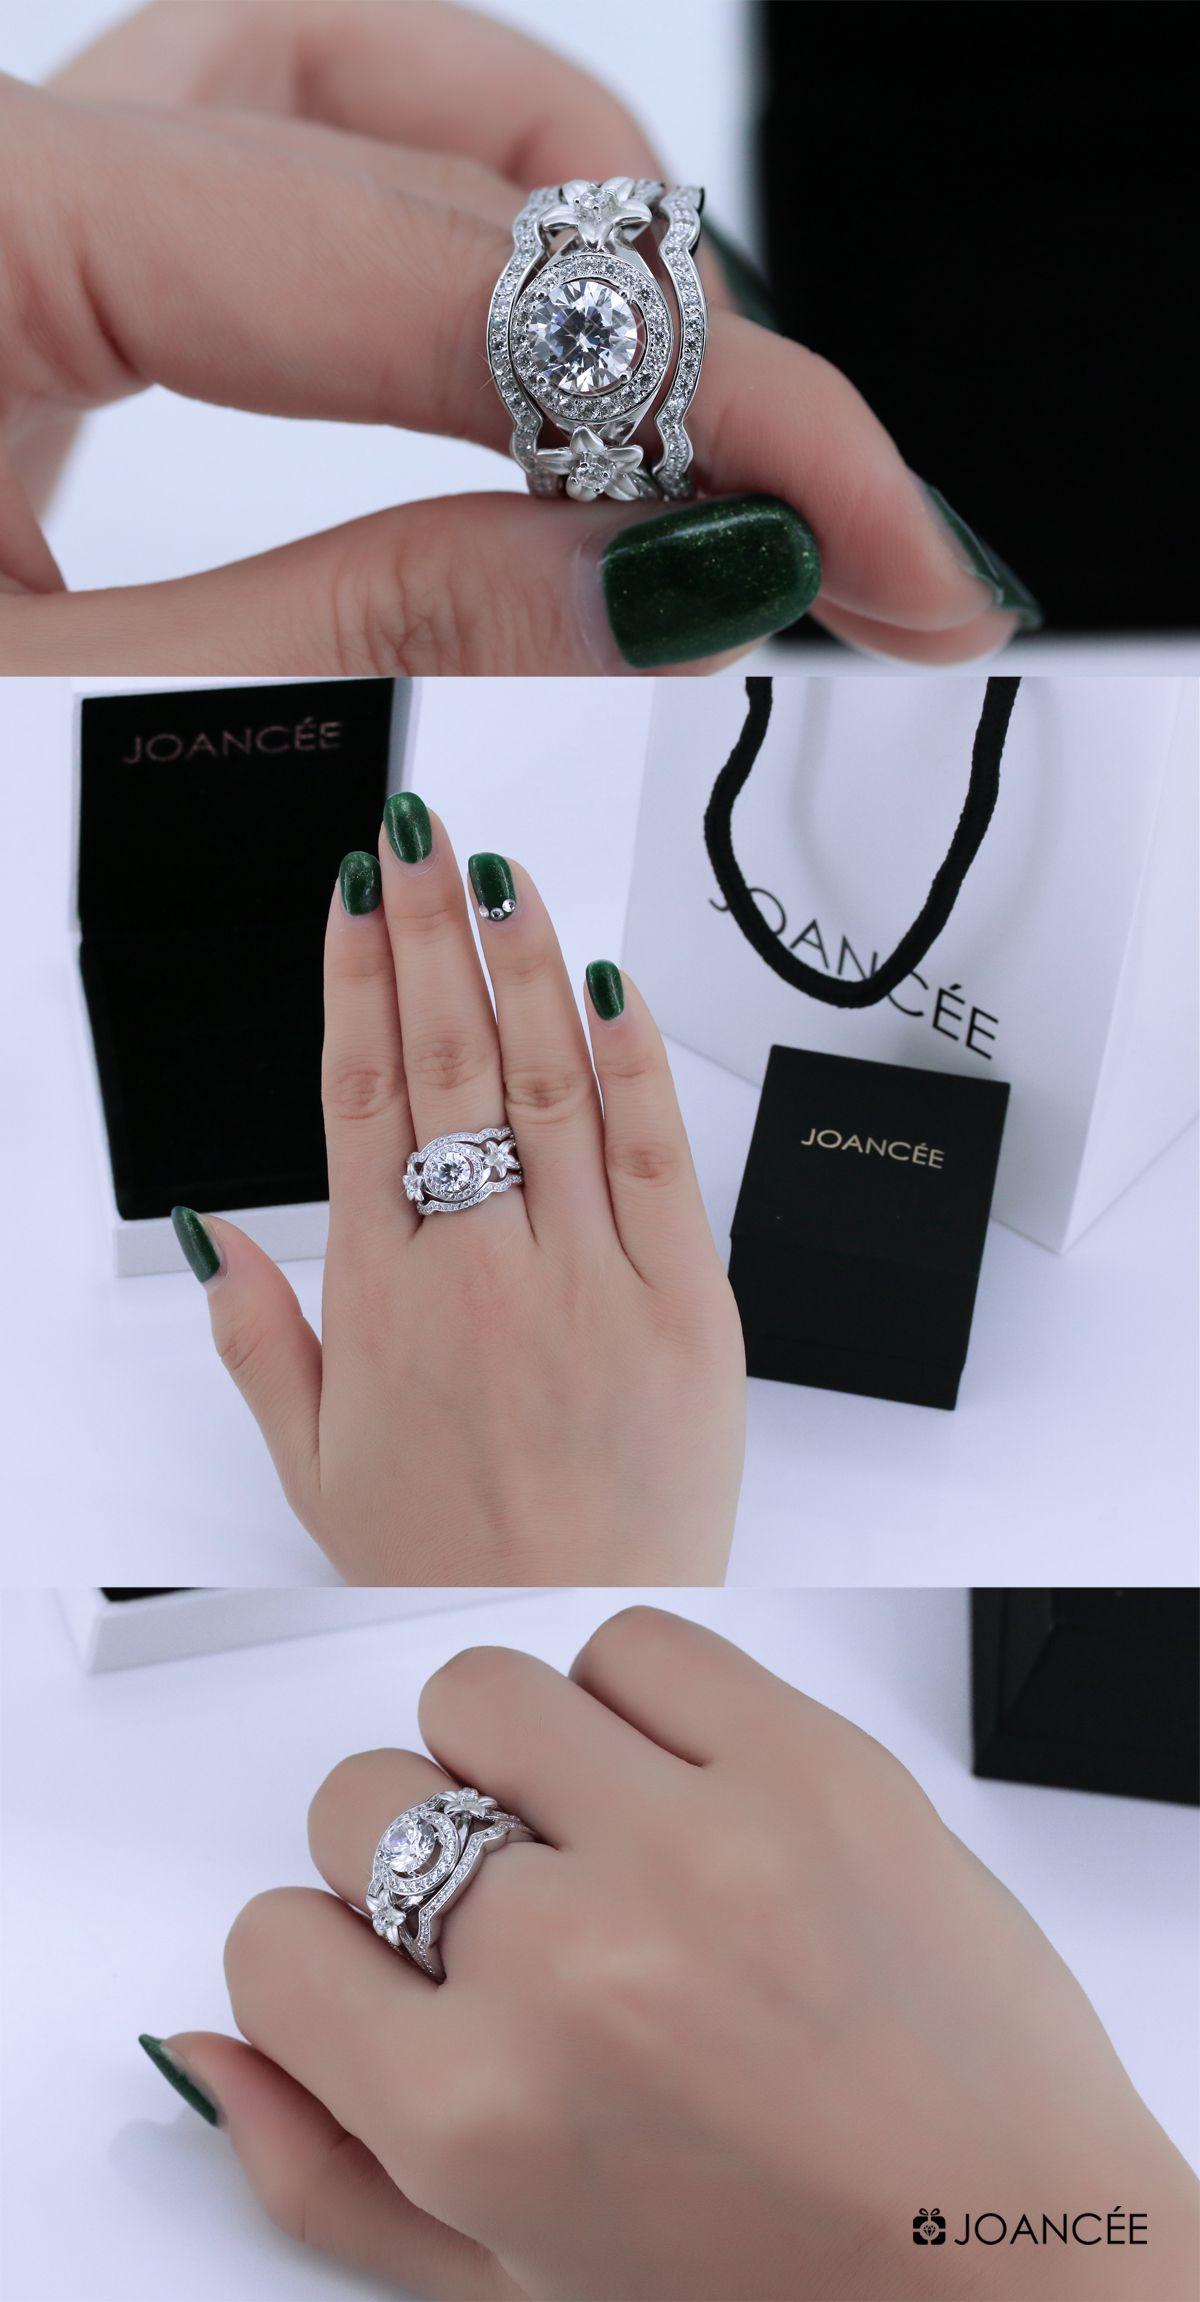 Joancee Bridal Ring Sets 810322 For Wedding Engagement